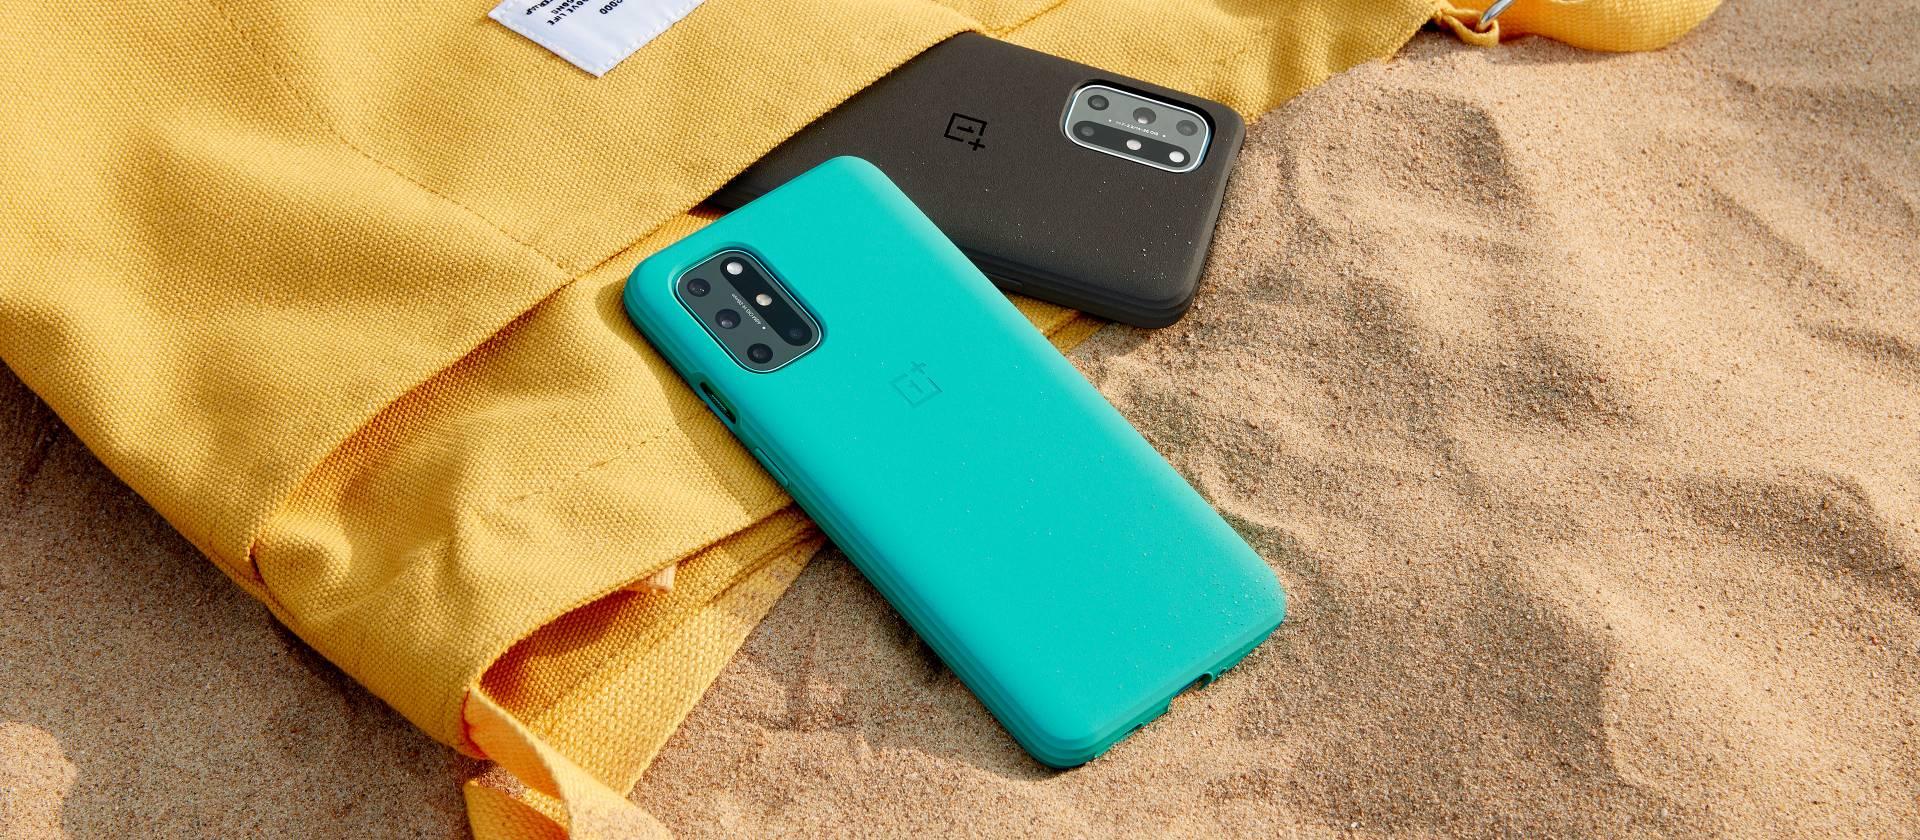 OnePlus_8T_Sandstone_Bumper_Case-02.jpg